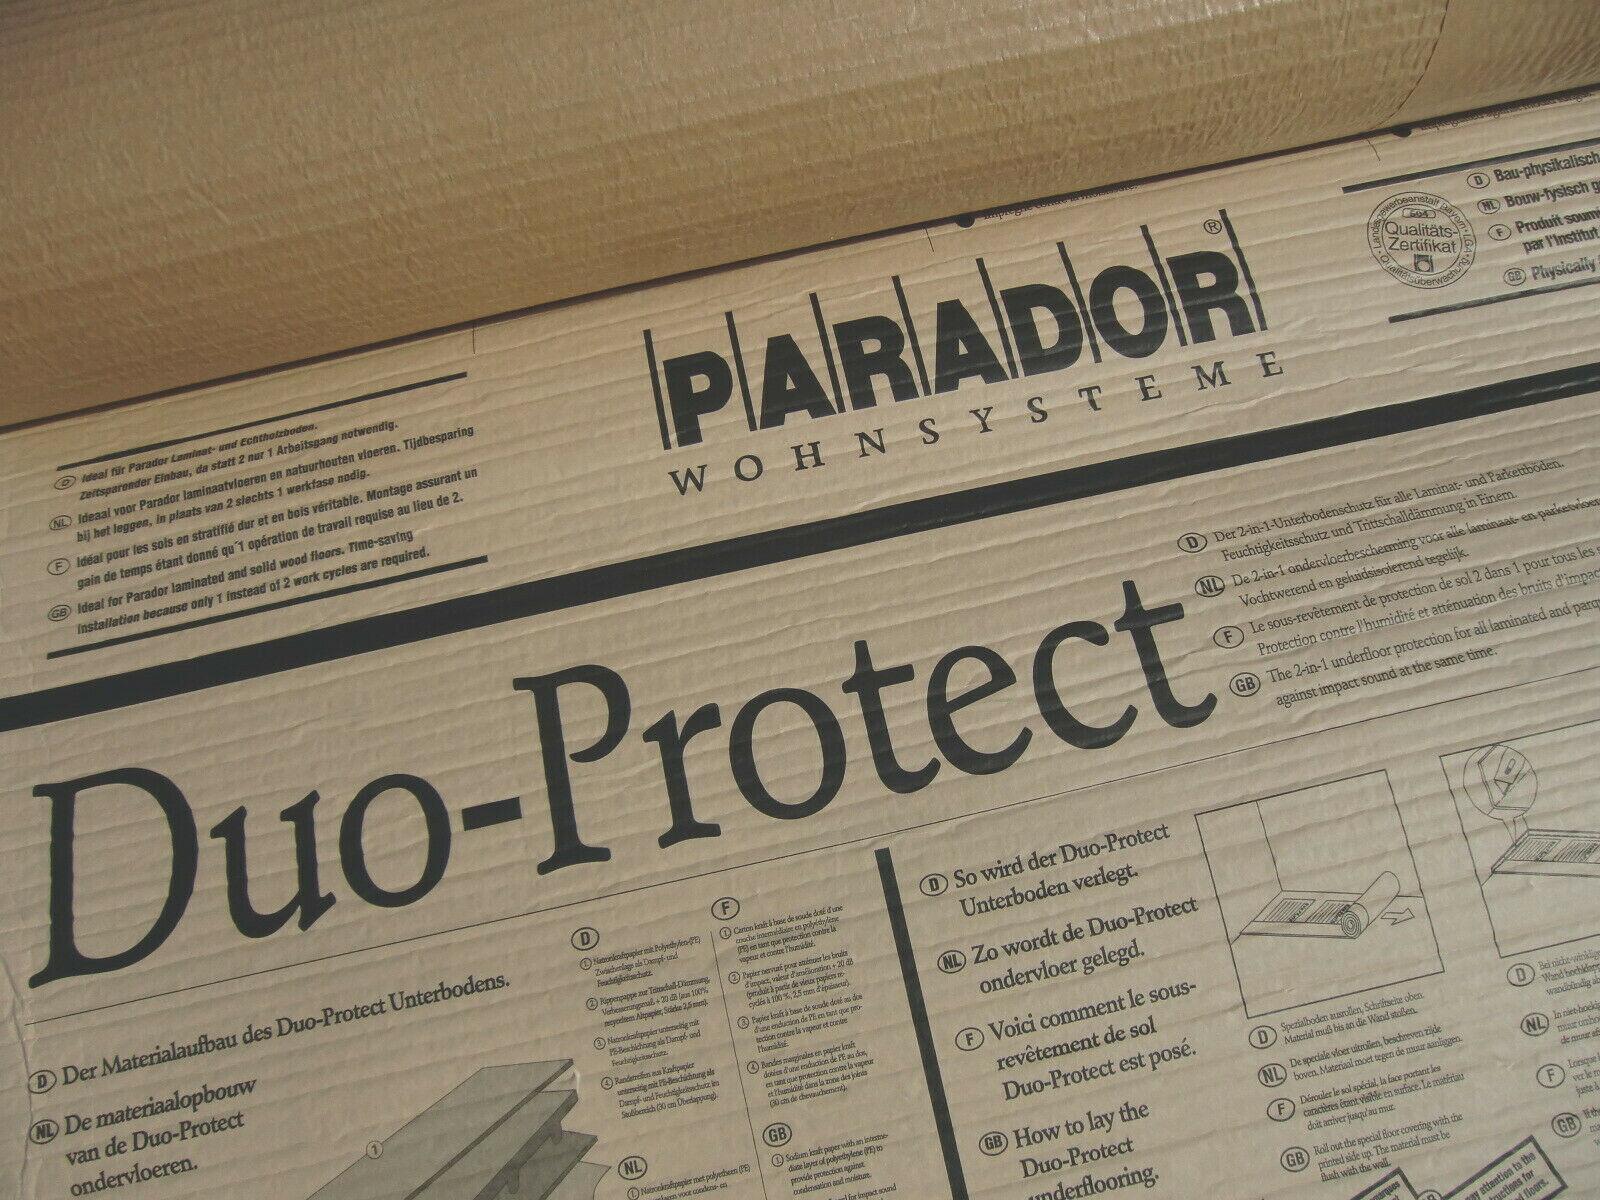 30 m² Rolle PARADOR Duo-Protect Trittschalldämmung unter Parkett & Laminat NEU